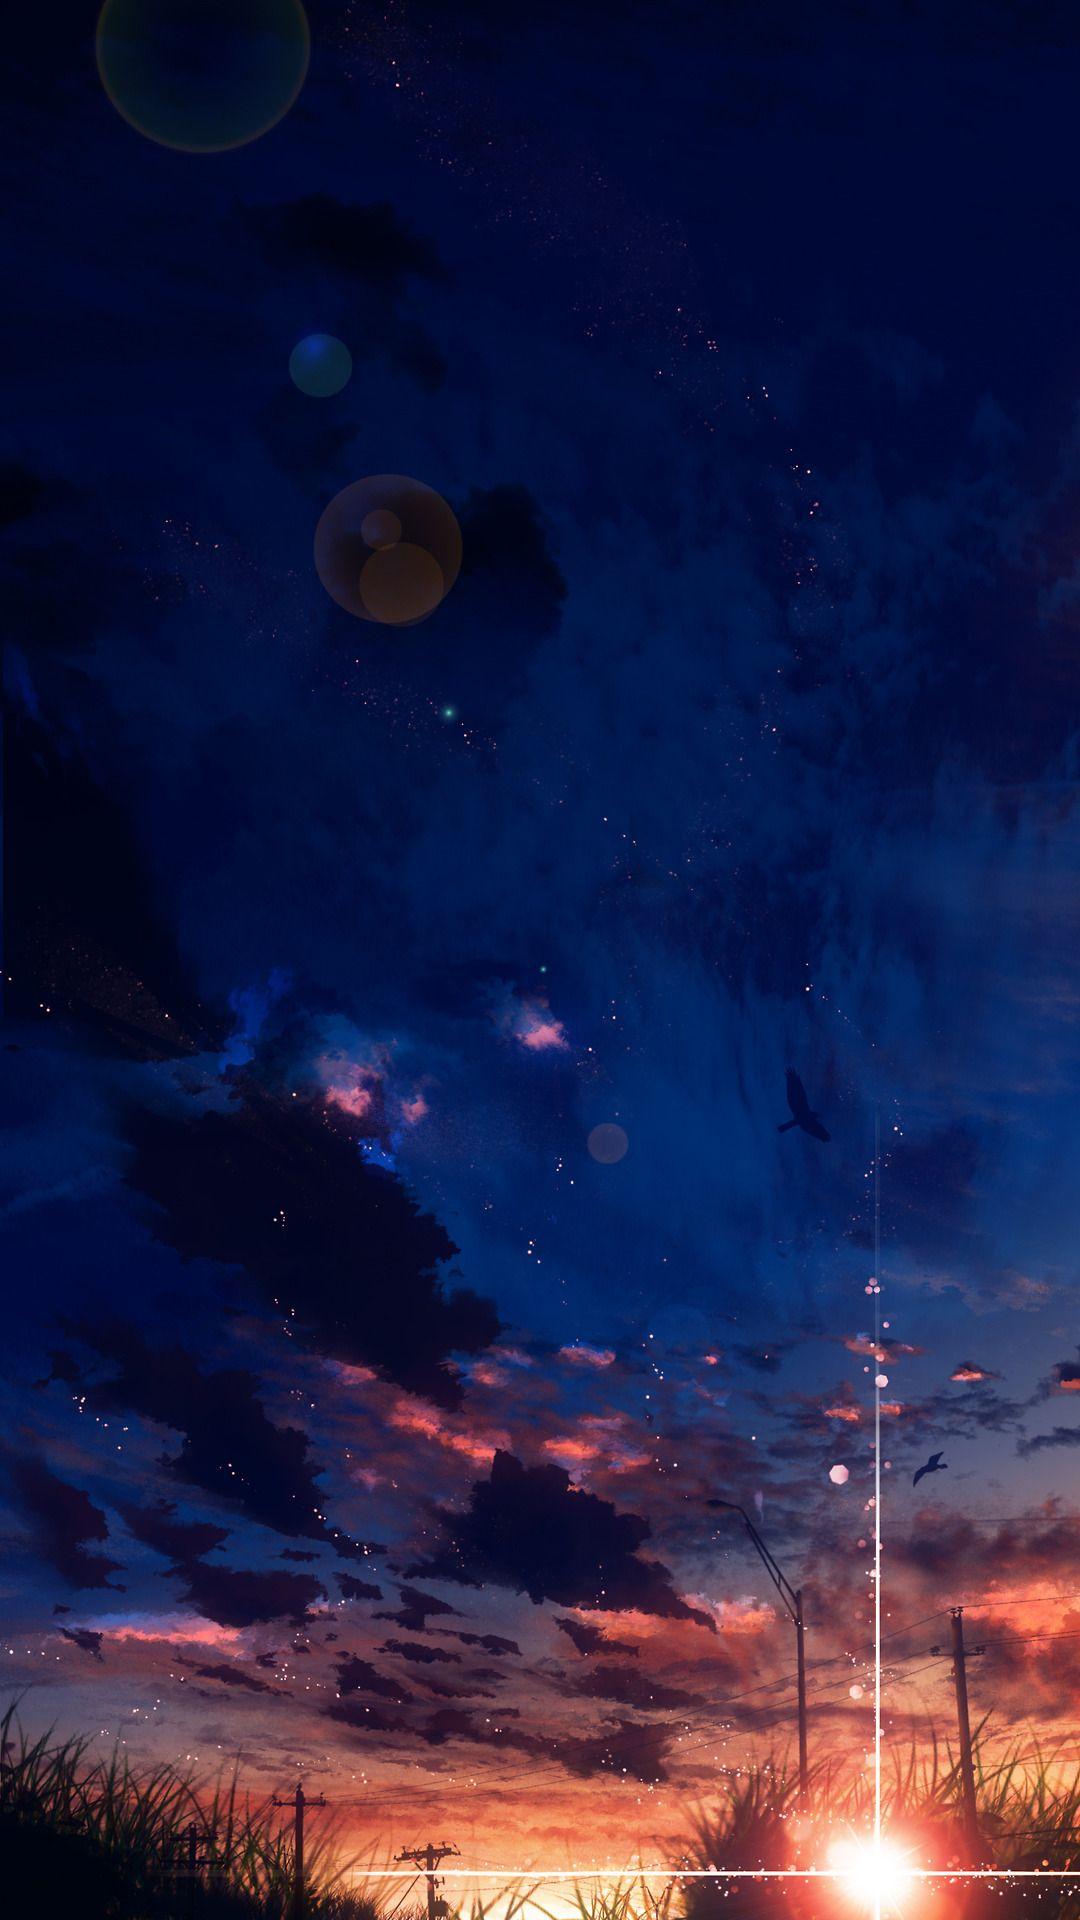 Pin By Hiro Iro On Backgrounds Anime Scenery Anime Scenery Wallpaper Scenery Wallpaper